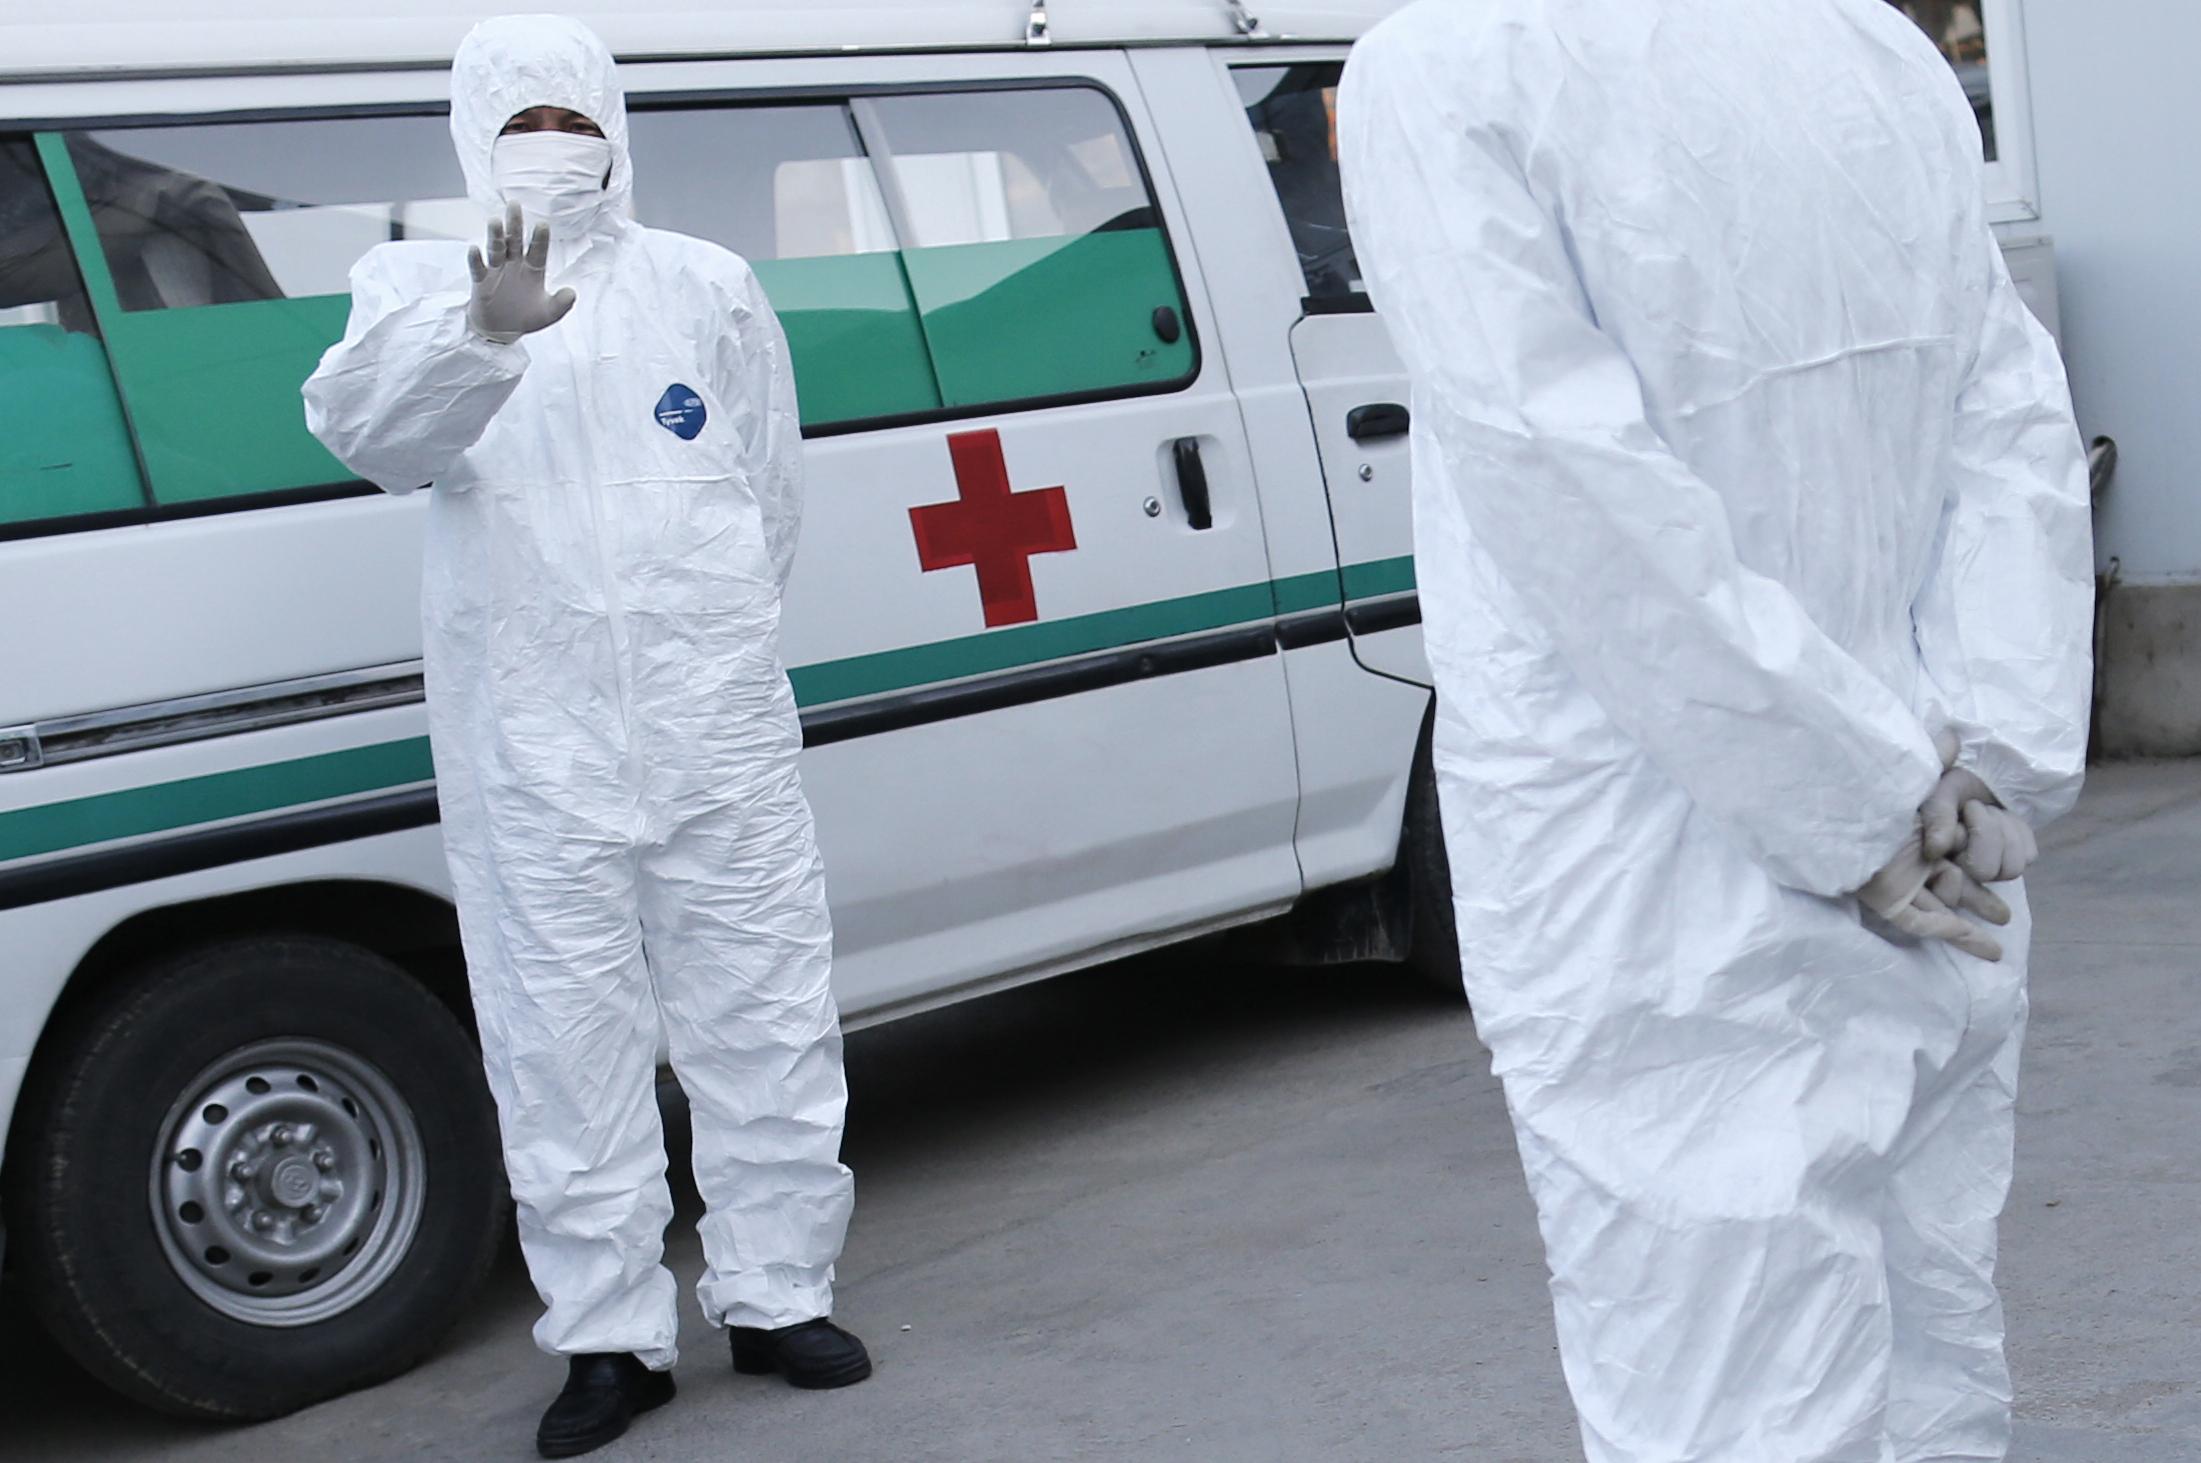 N. Korea imposes Ebola quarantine